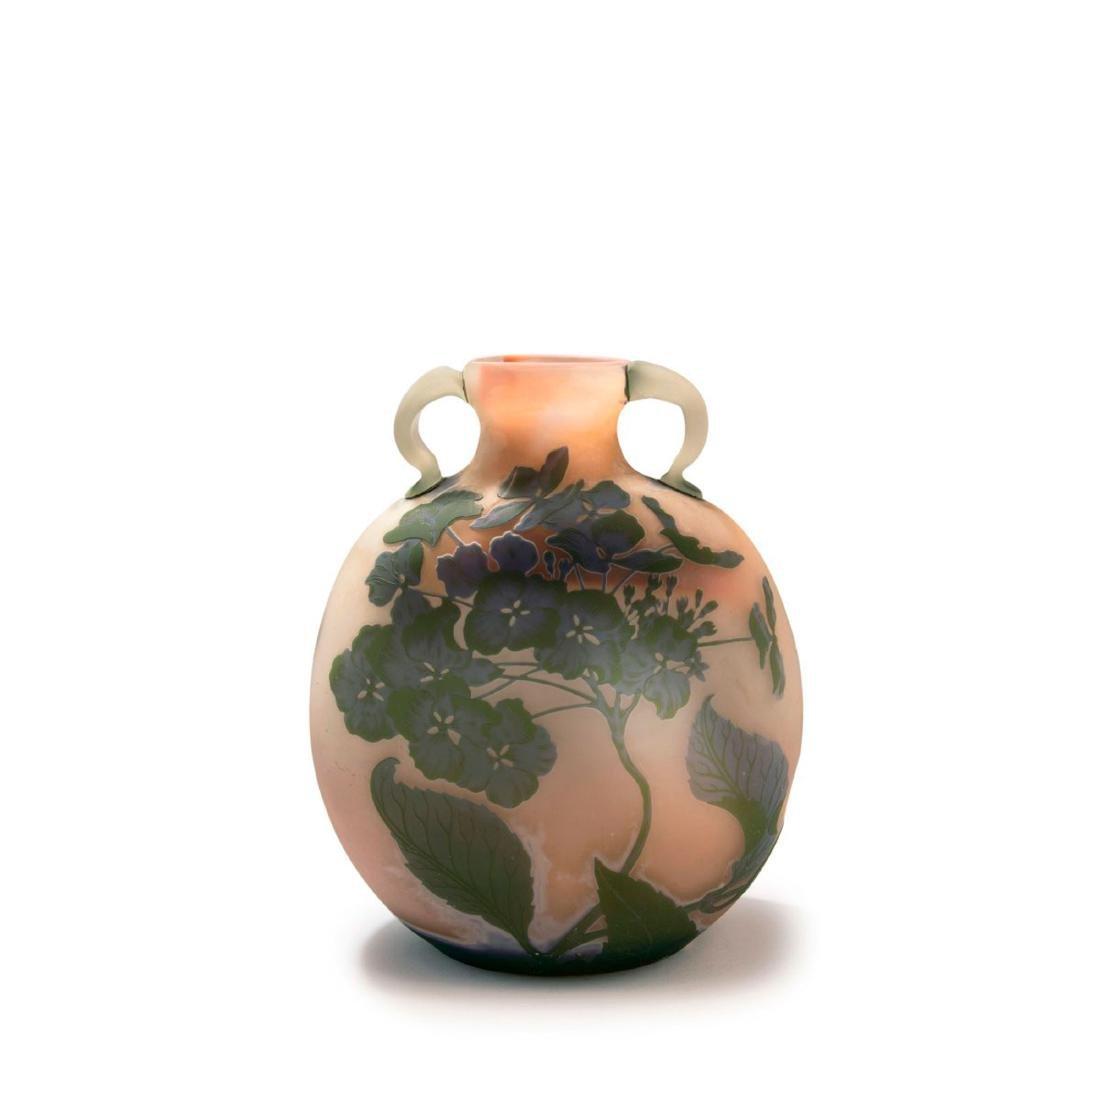 'Hortensias' vase with handles, 1902-03